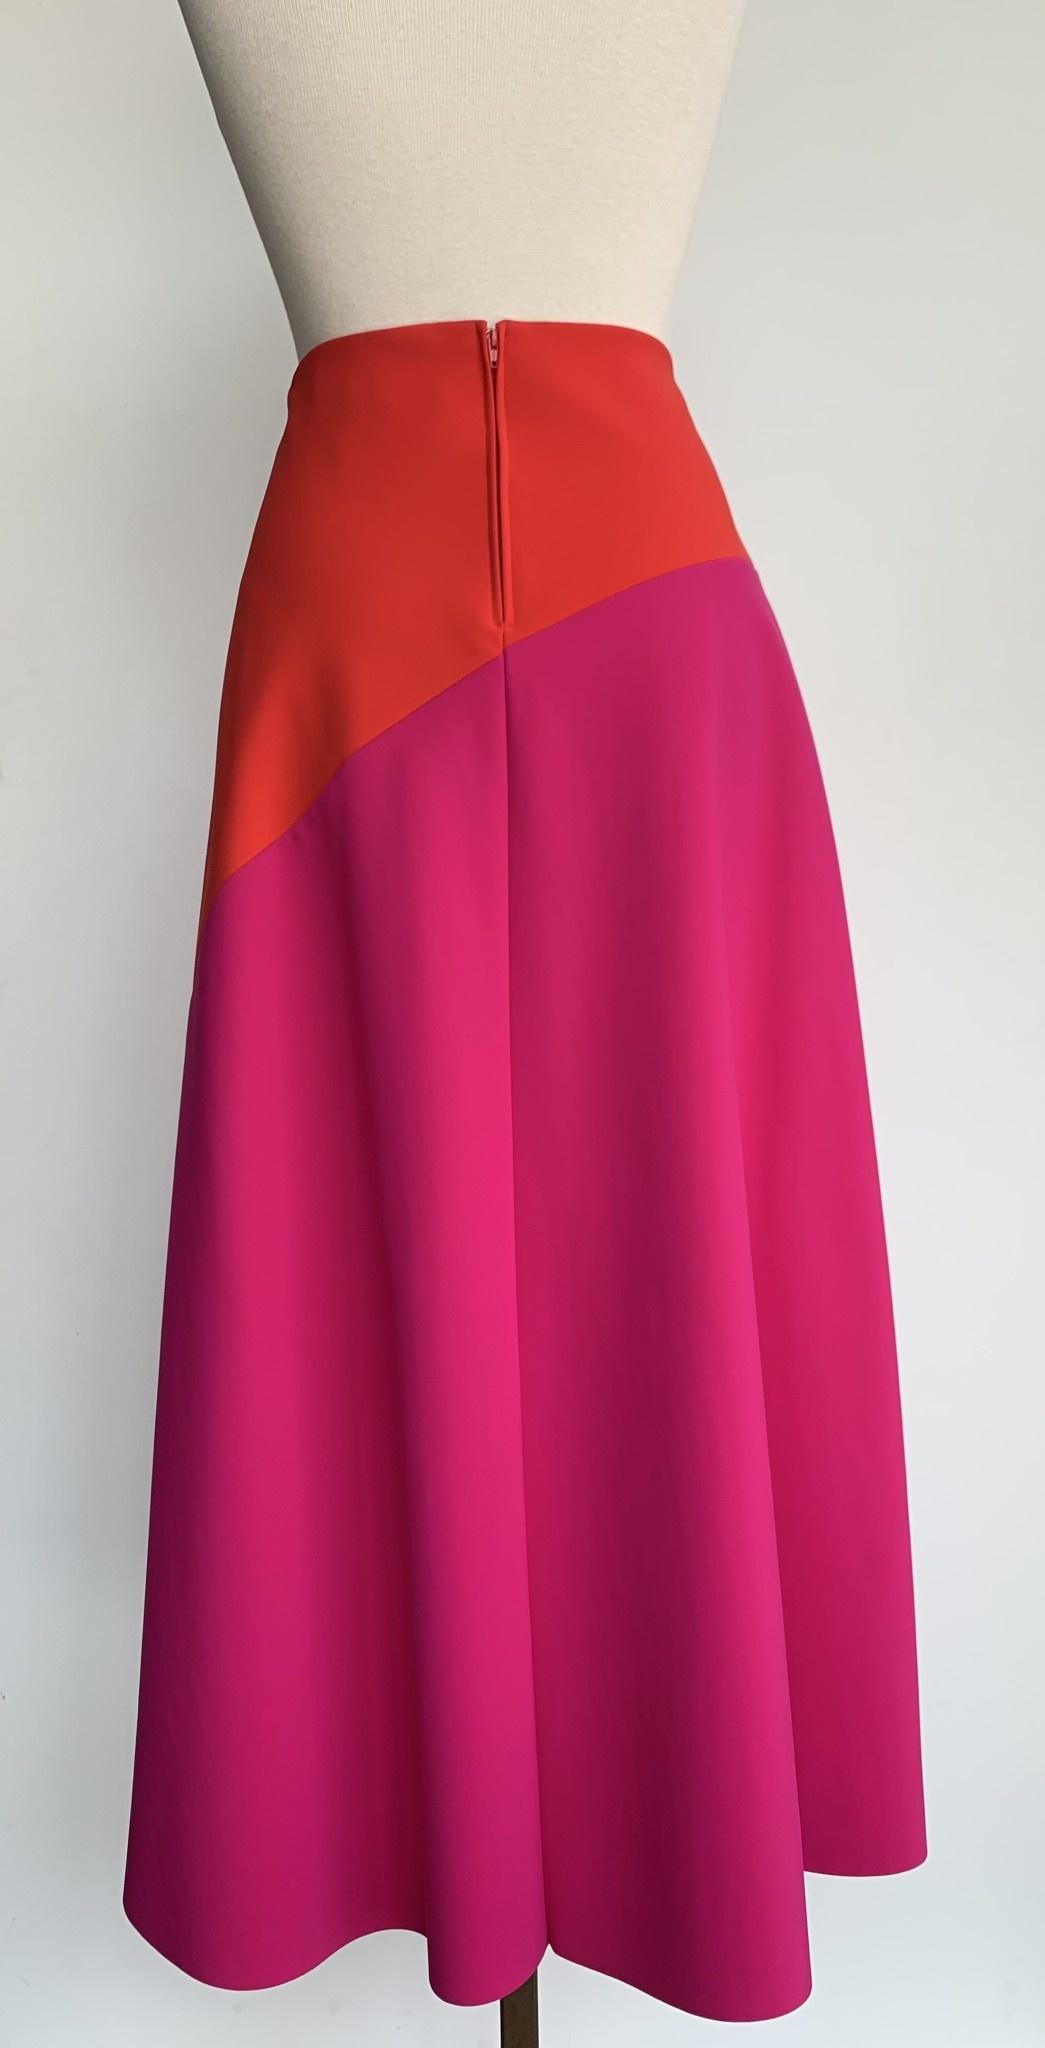 Greta Constantine Barranca Skirt